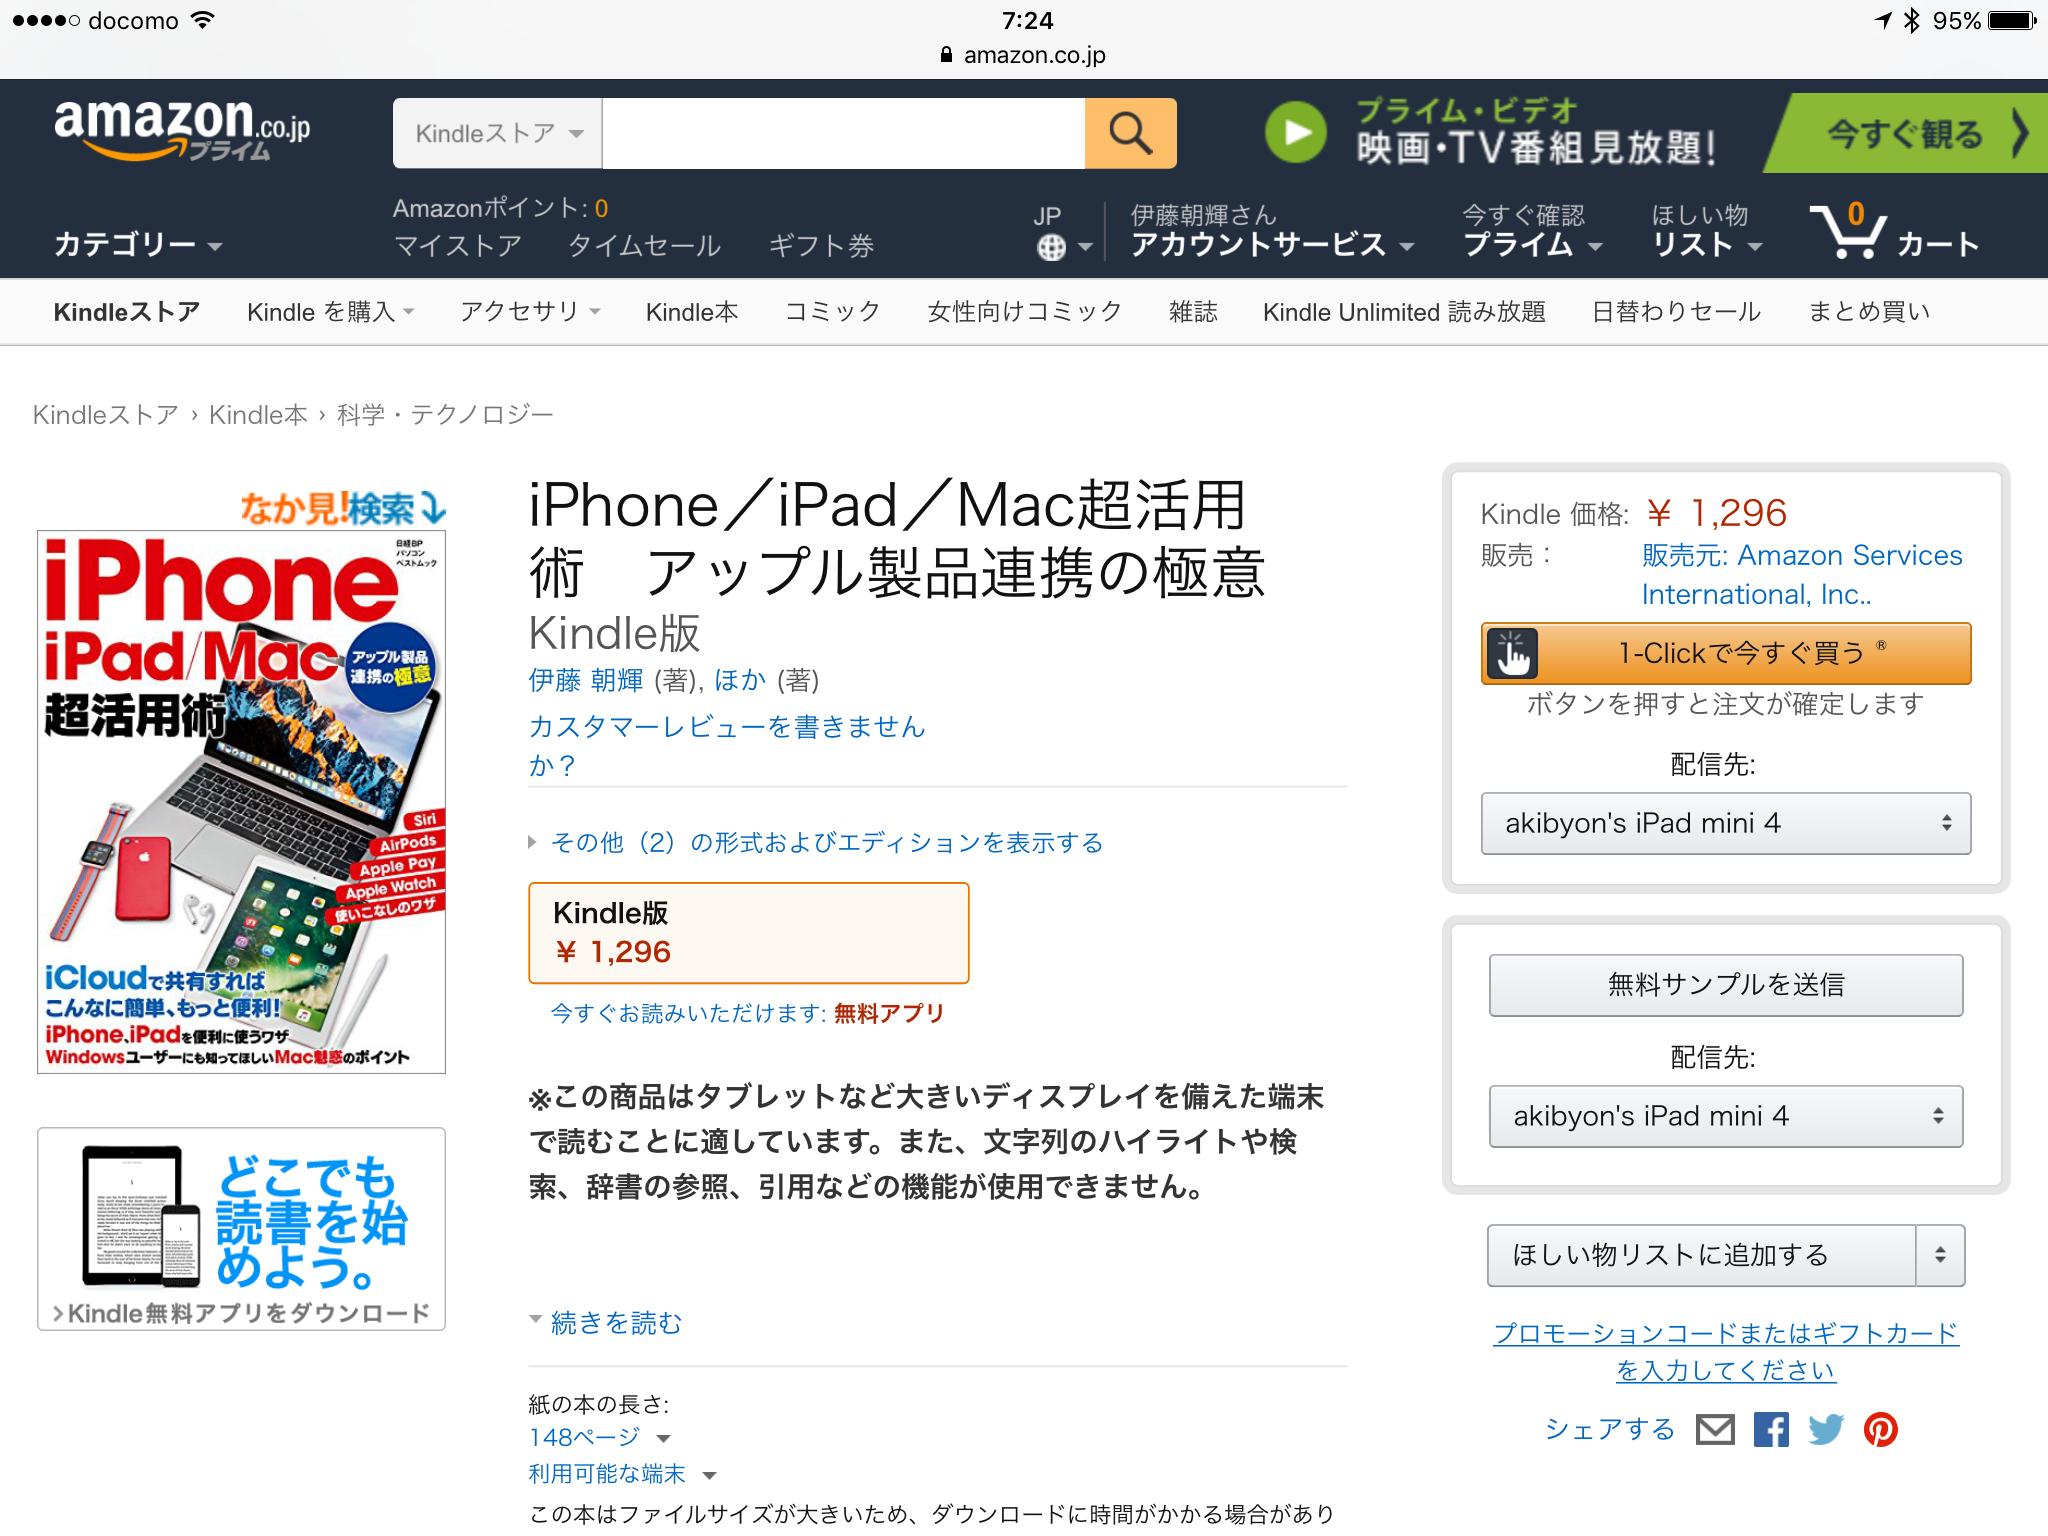 iPhone/iPad/Mac超活用術Kindle版